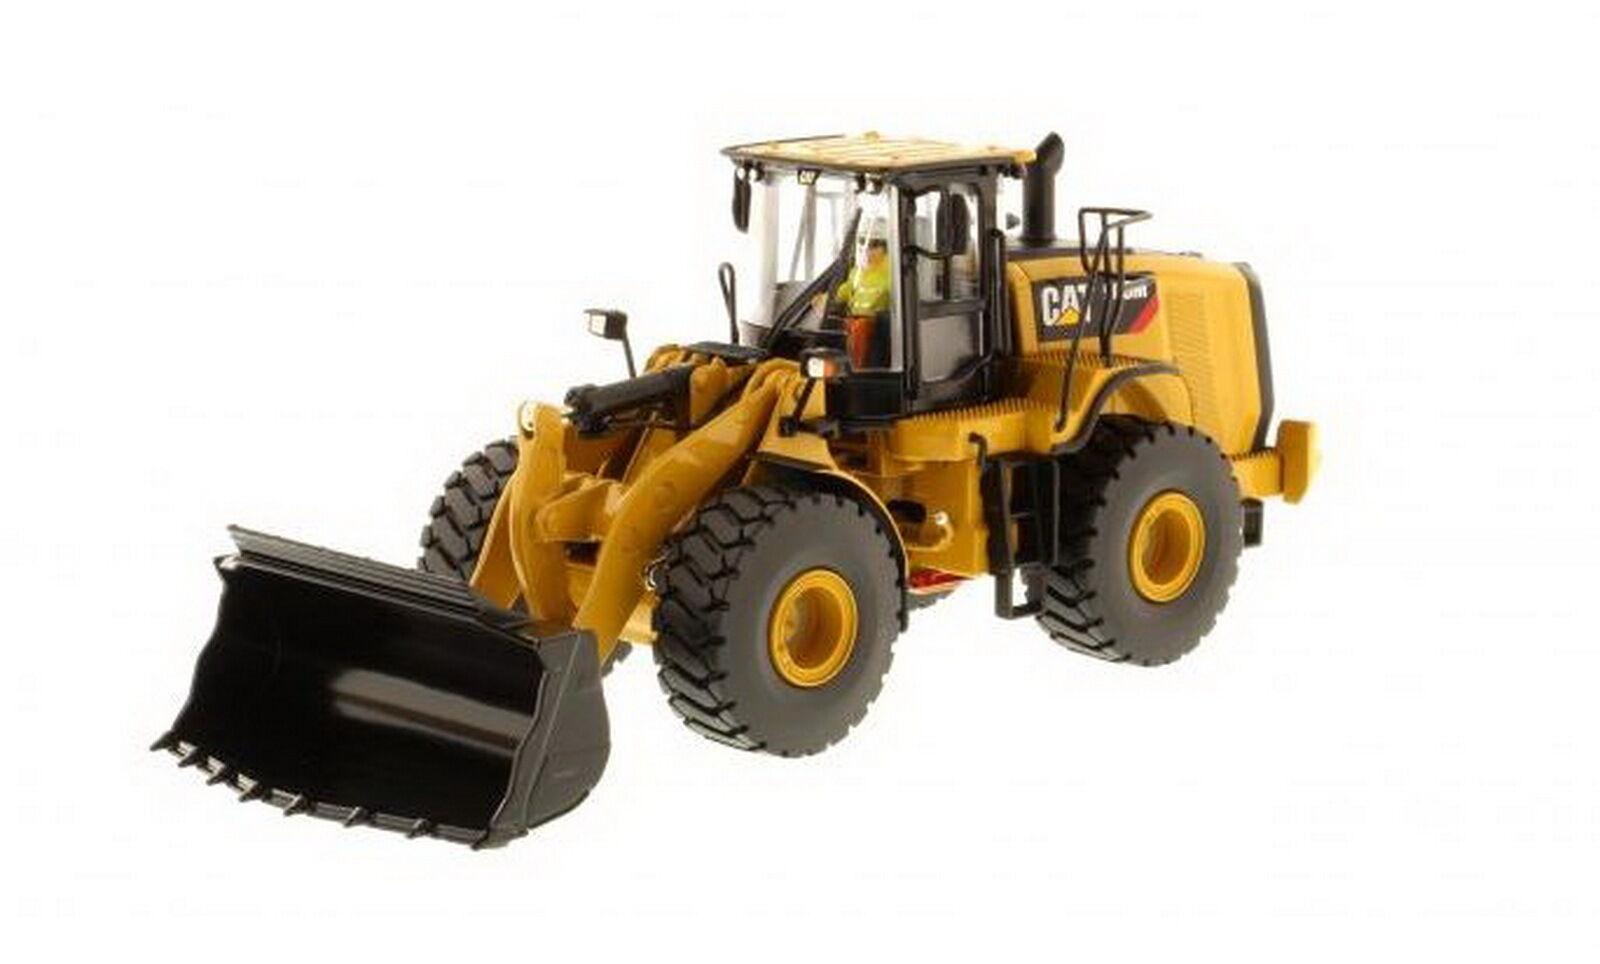 1 50 DM Caterpillar Cat 966M Wheel Loader Diecast Model